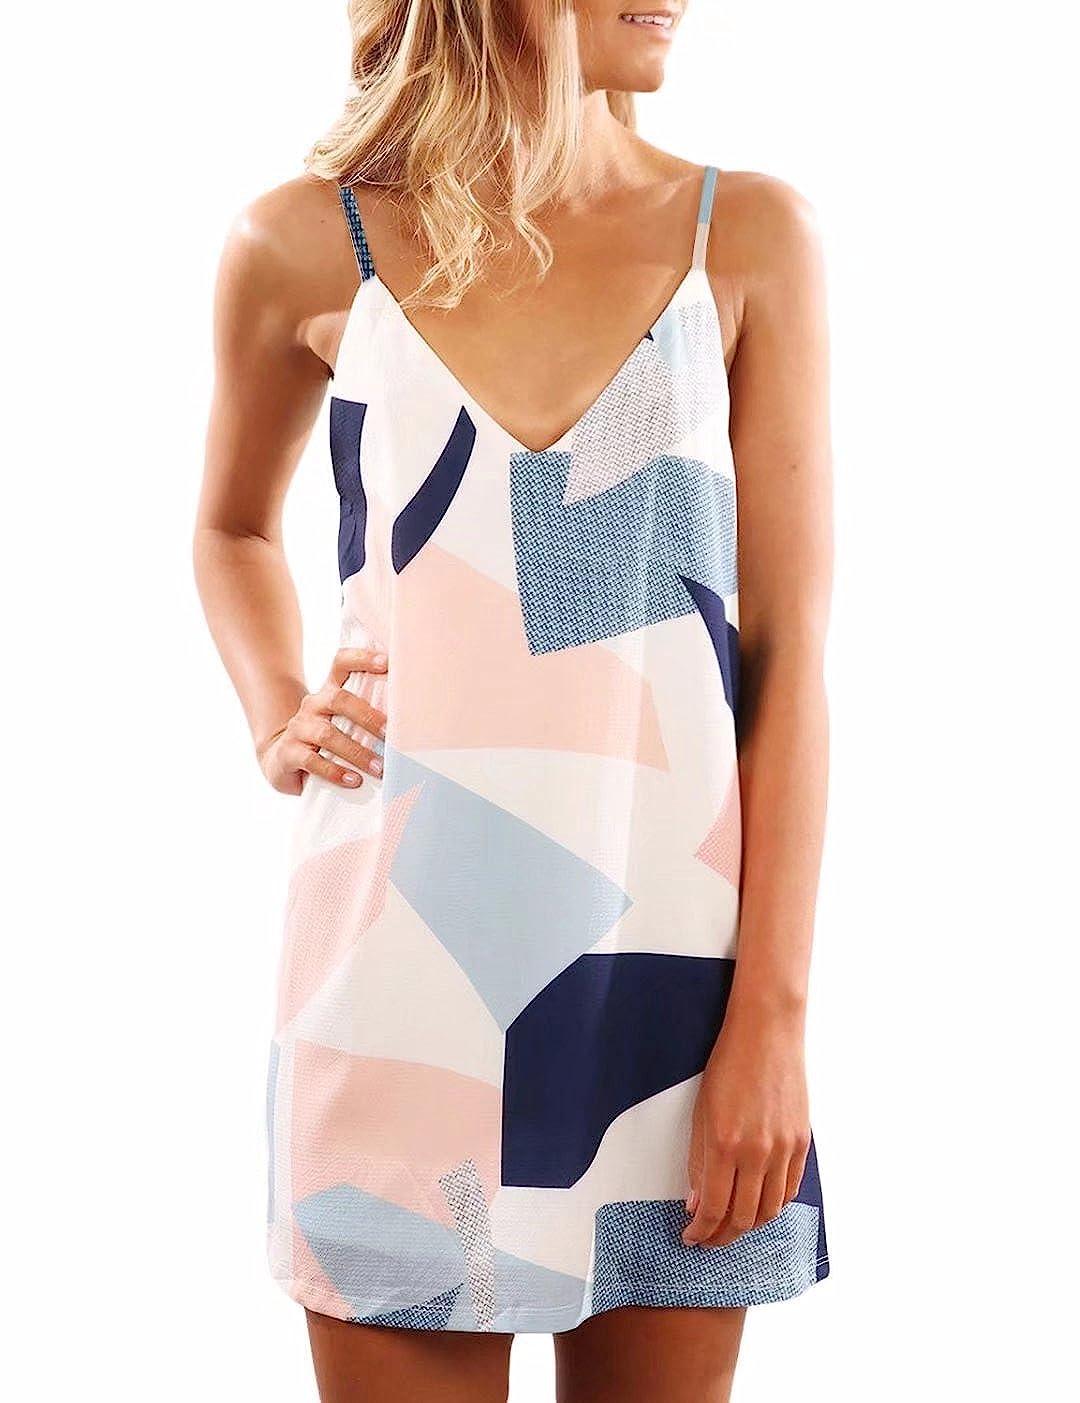 Yandw Damen Sommerkleid Elegant Ärmellos V-Ausschnitt Chiffon Boho Casual Strandkleid Minikleider